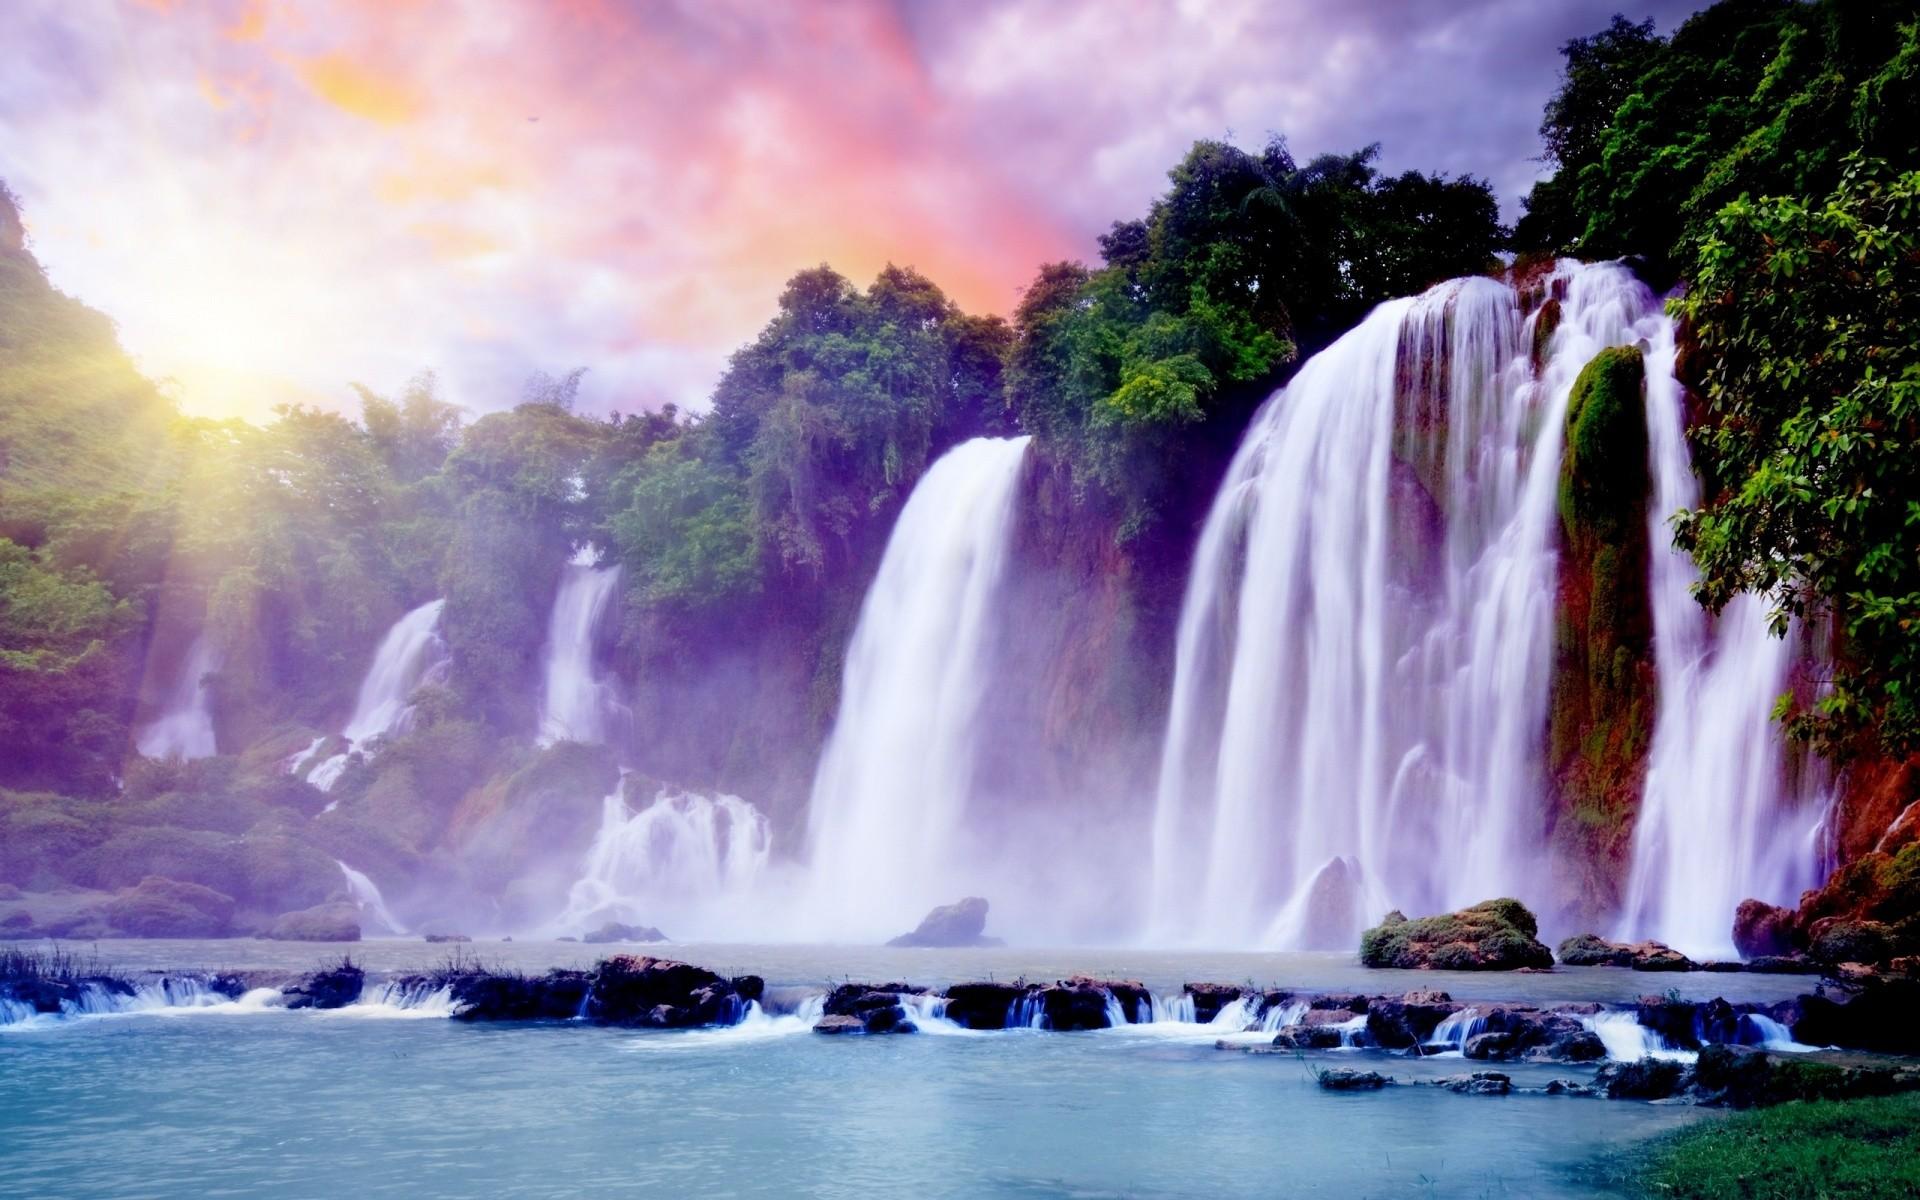 Waterfall HD Wallpapers Backgrounds Wallpaper | HD Wallpapers | Pinterest |  Hd wallpaper, Wallpaper and Wallpaper backgrounds